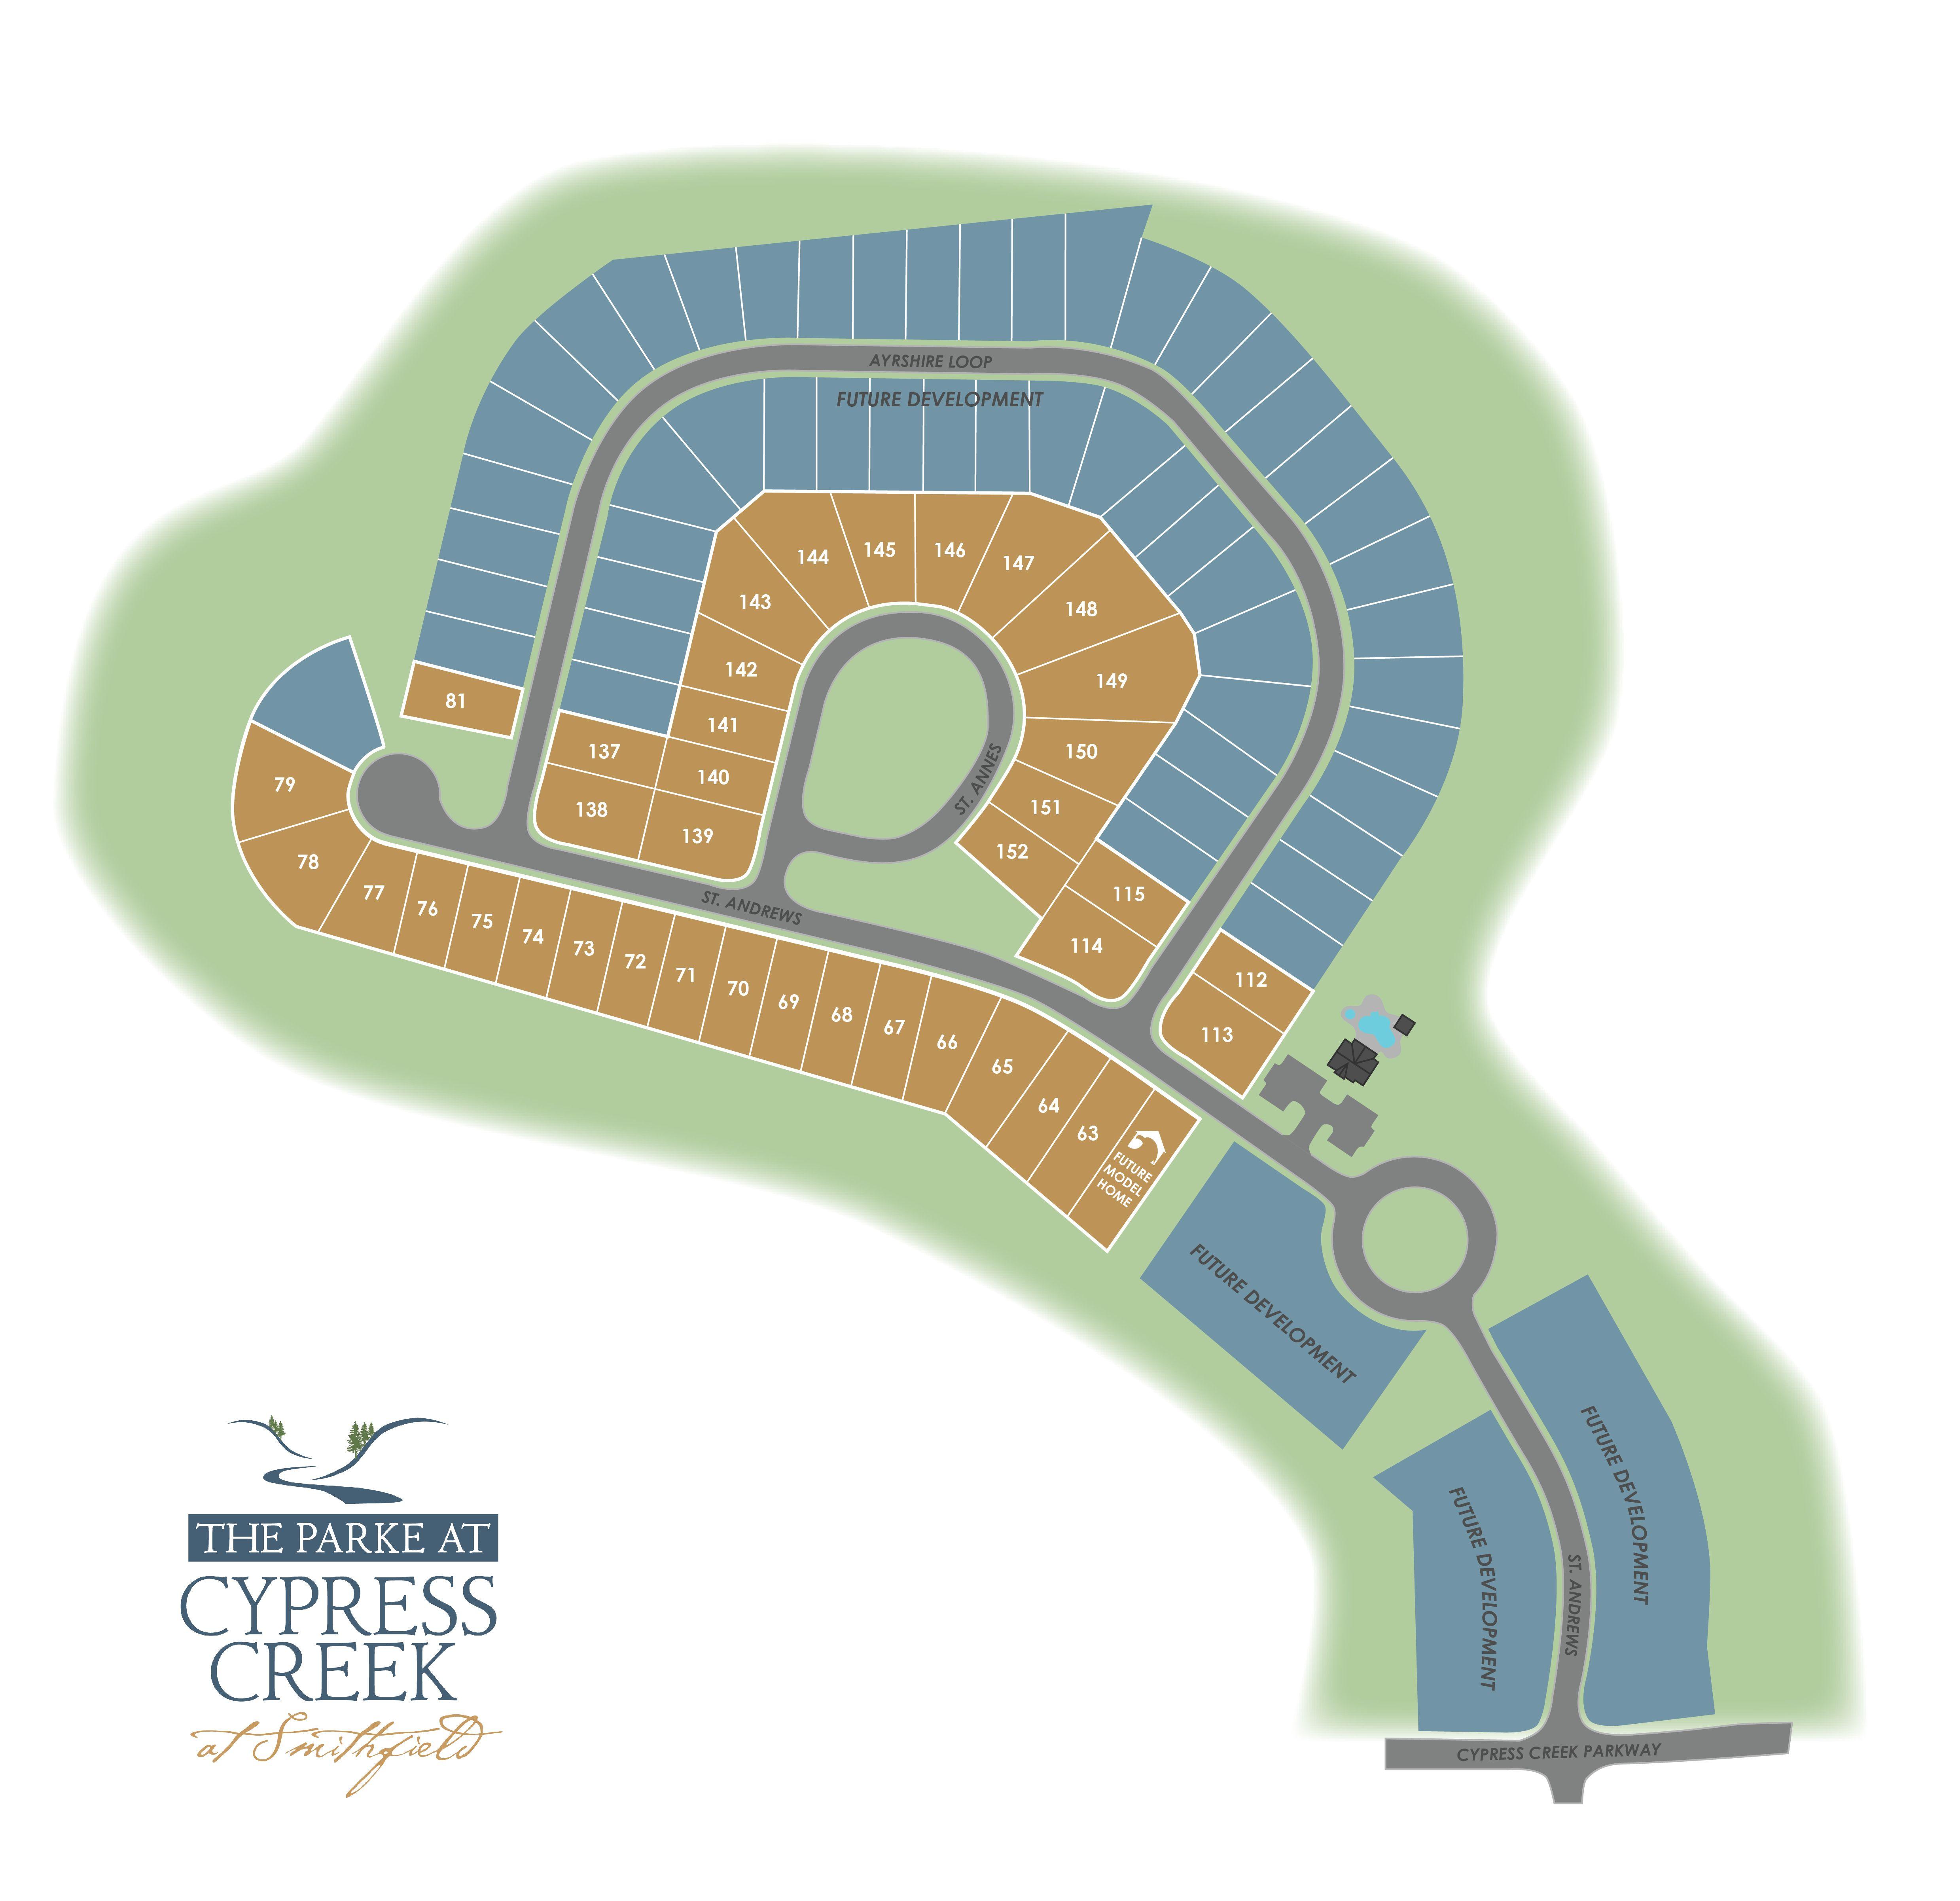 Smithfield, VA The Parke at Cypress Creek New Homes from Eagle Construction